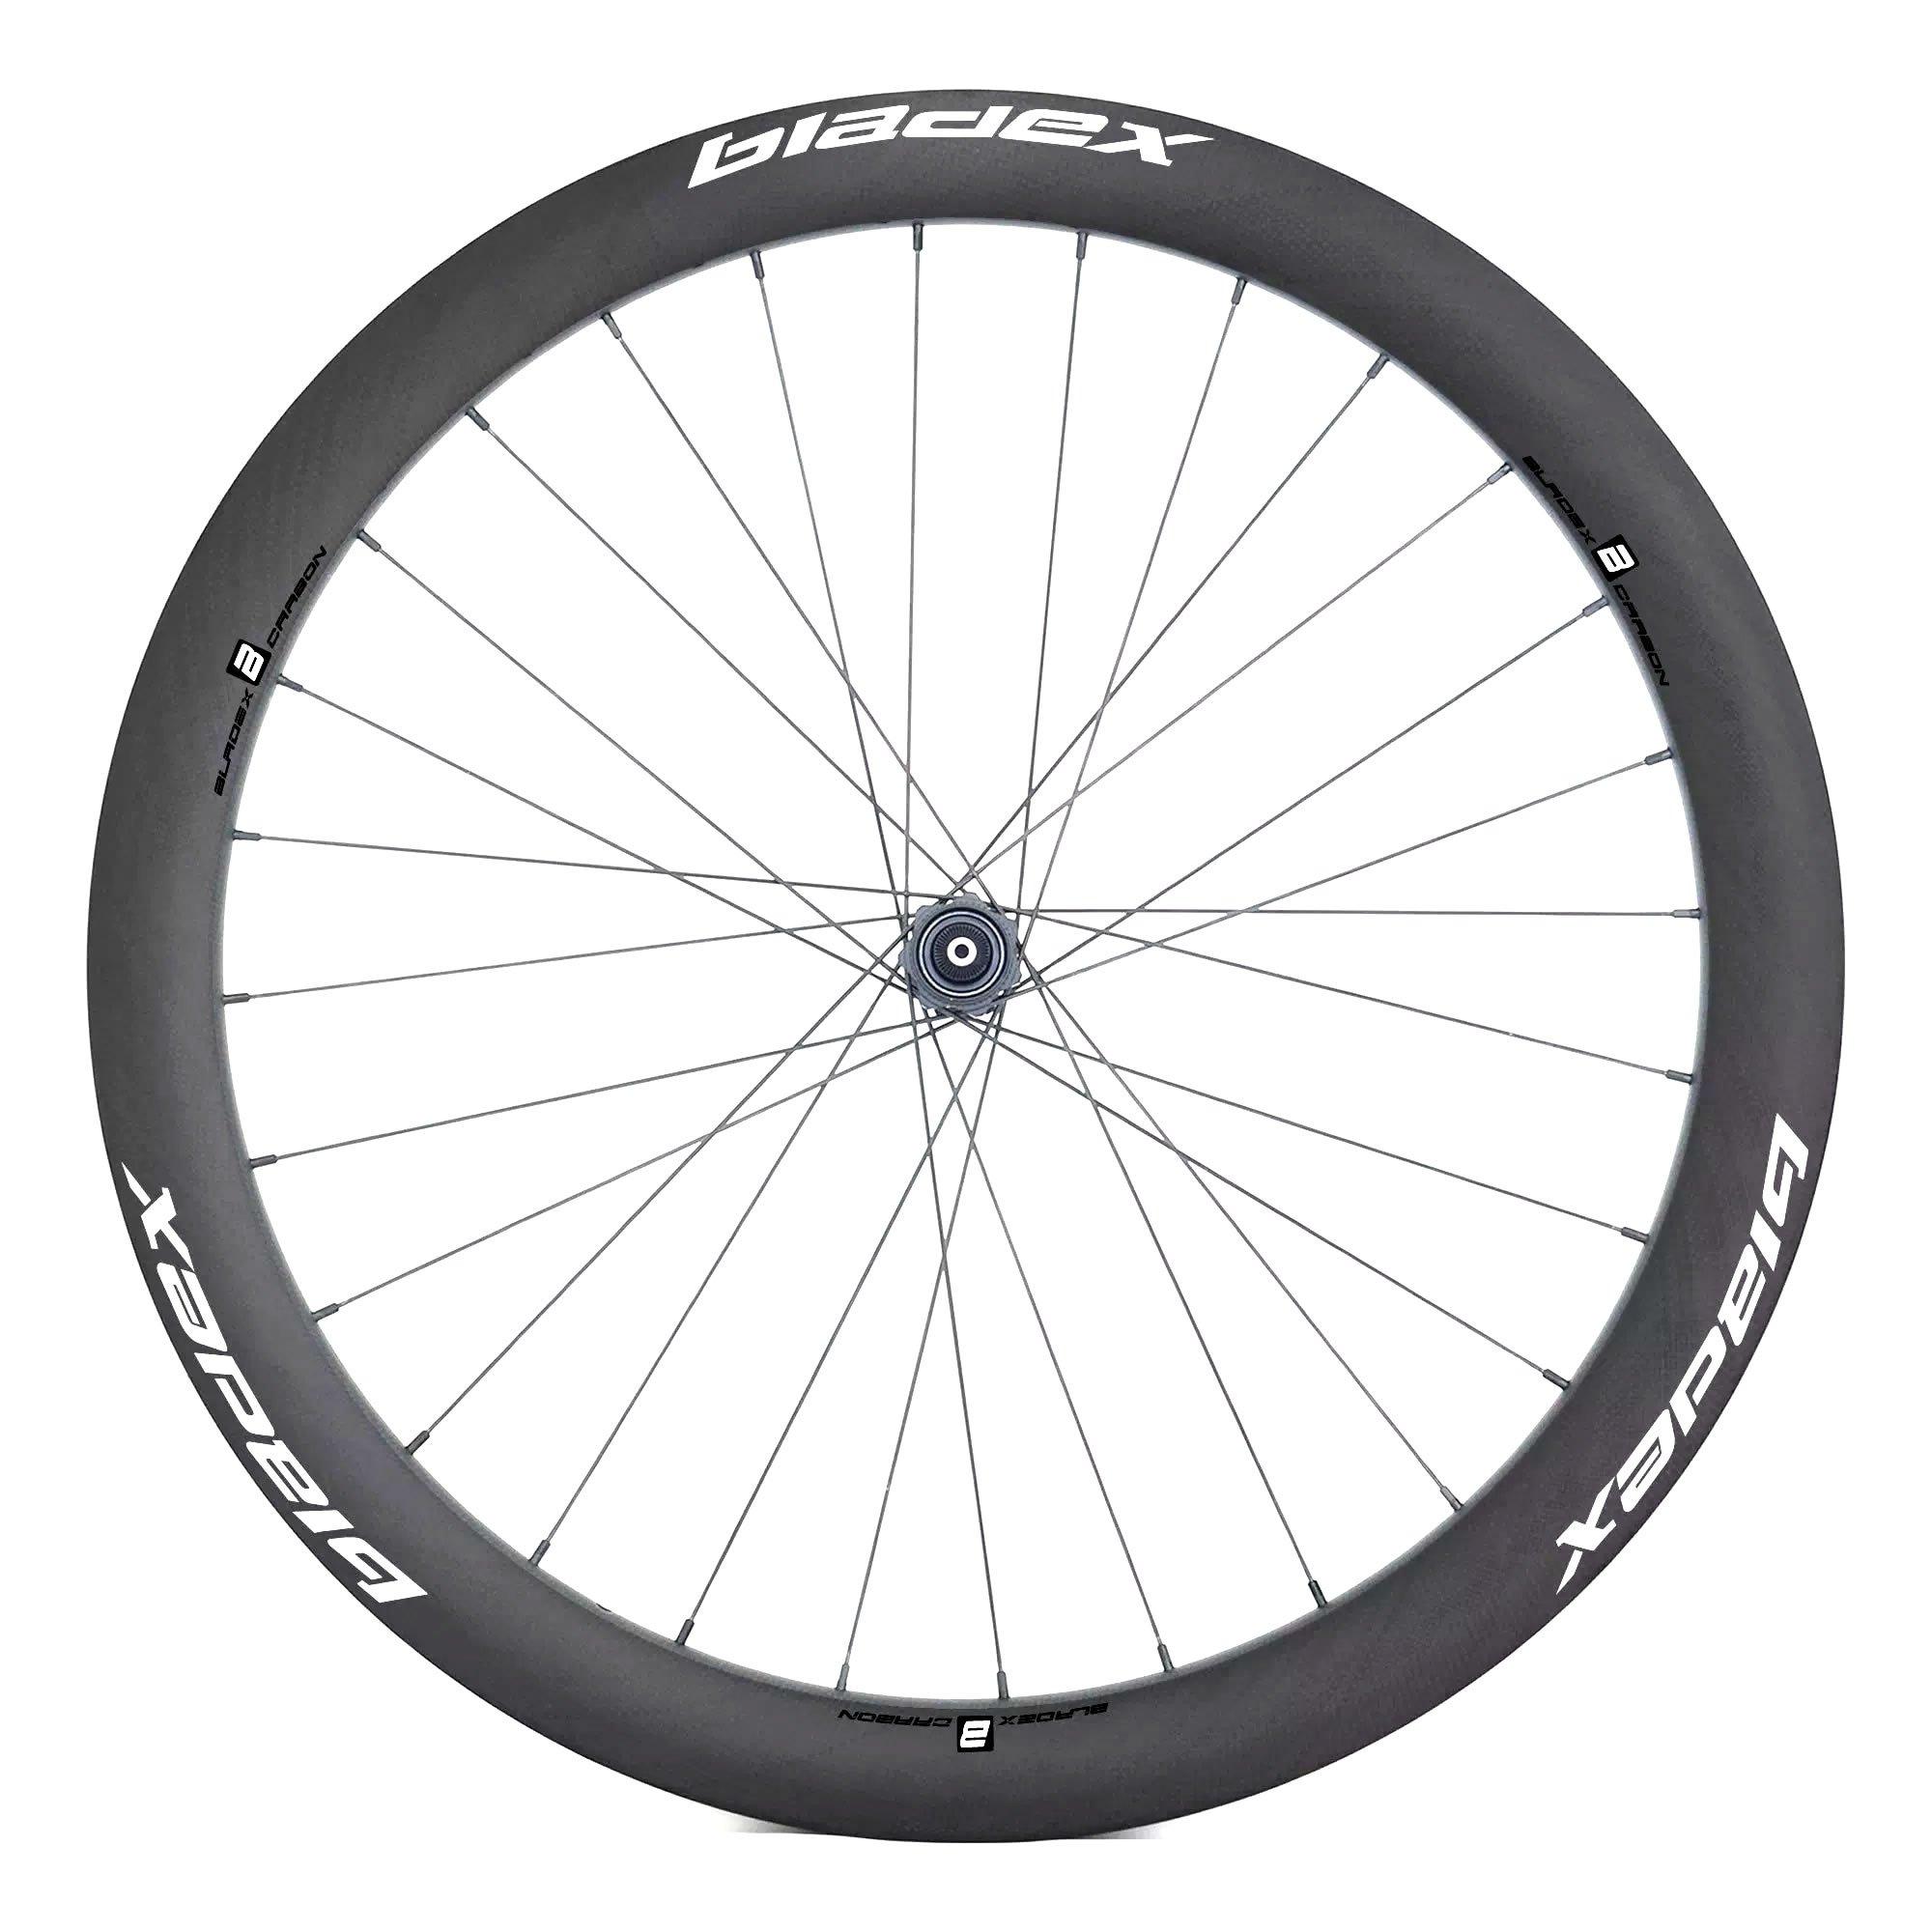 BladeX ULTIAMTE ROAD Disc Brake Road Bike Wheelset Front With Blue Logo